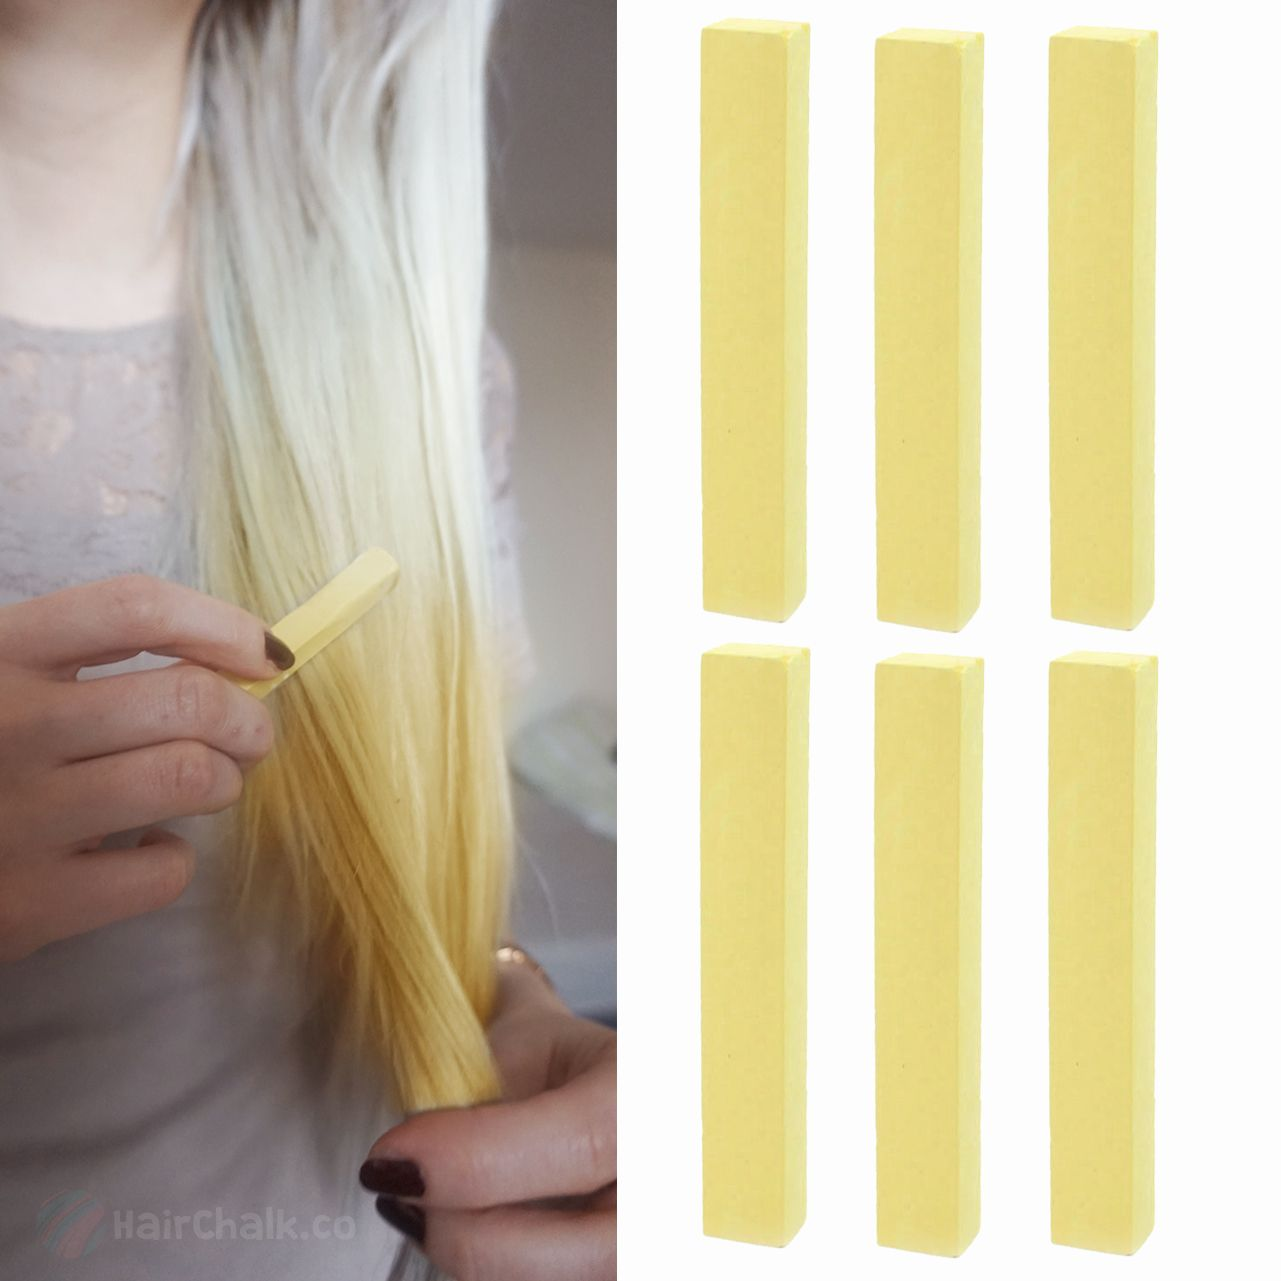 Wheat Blonde Kim Kardashian Style Hair Dye Beige Hair Temporary